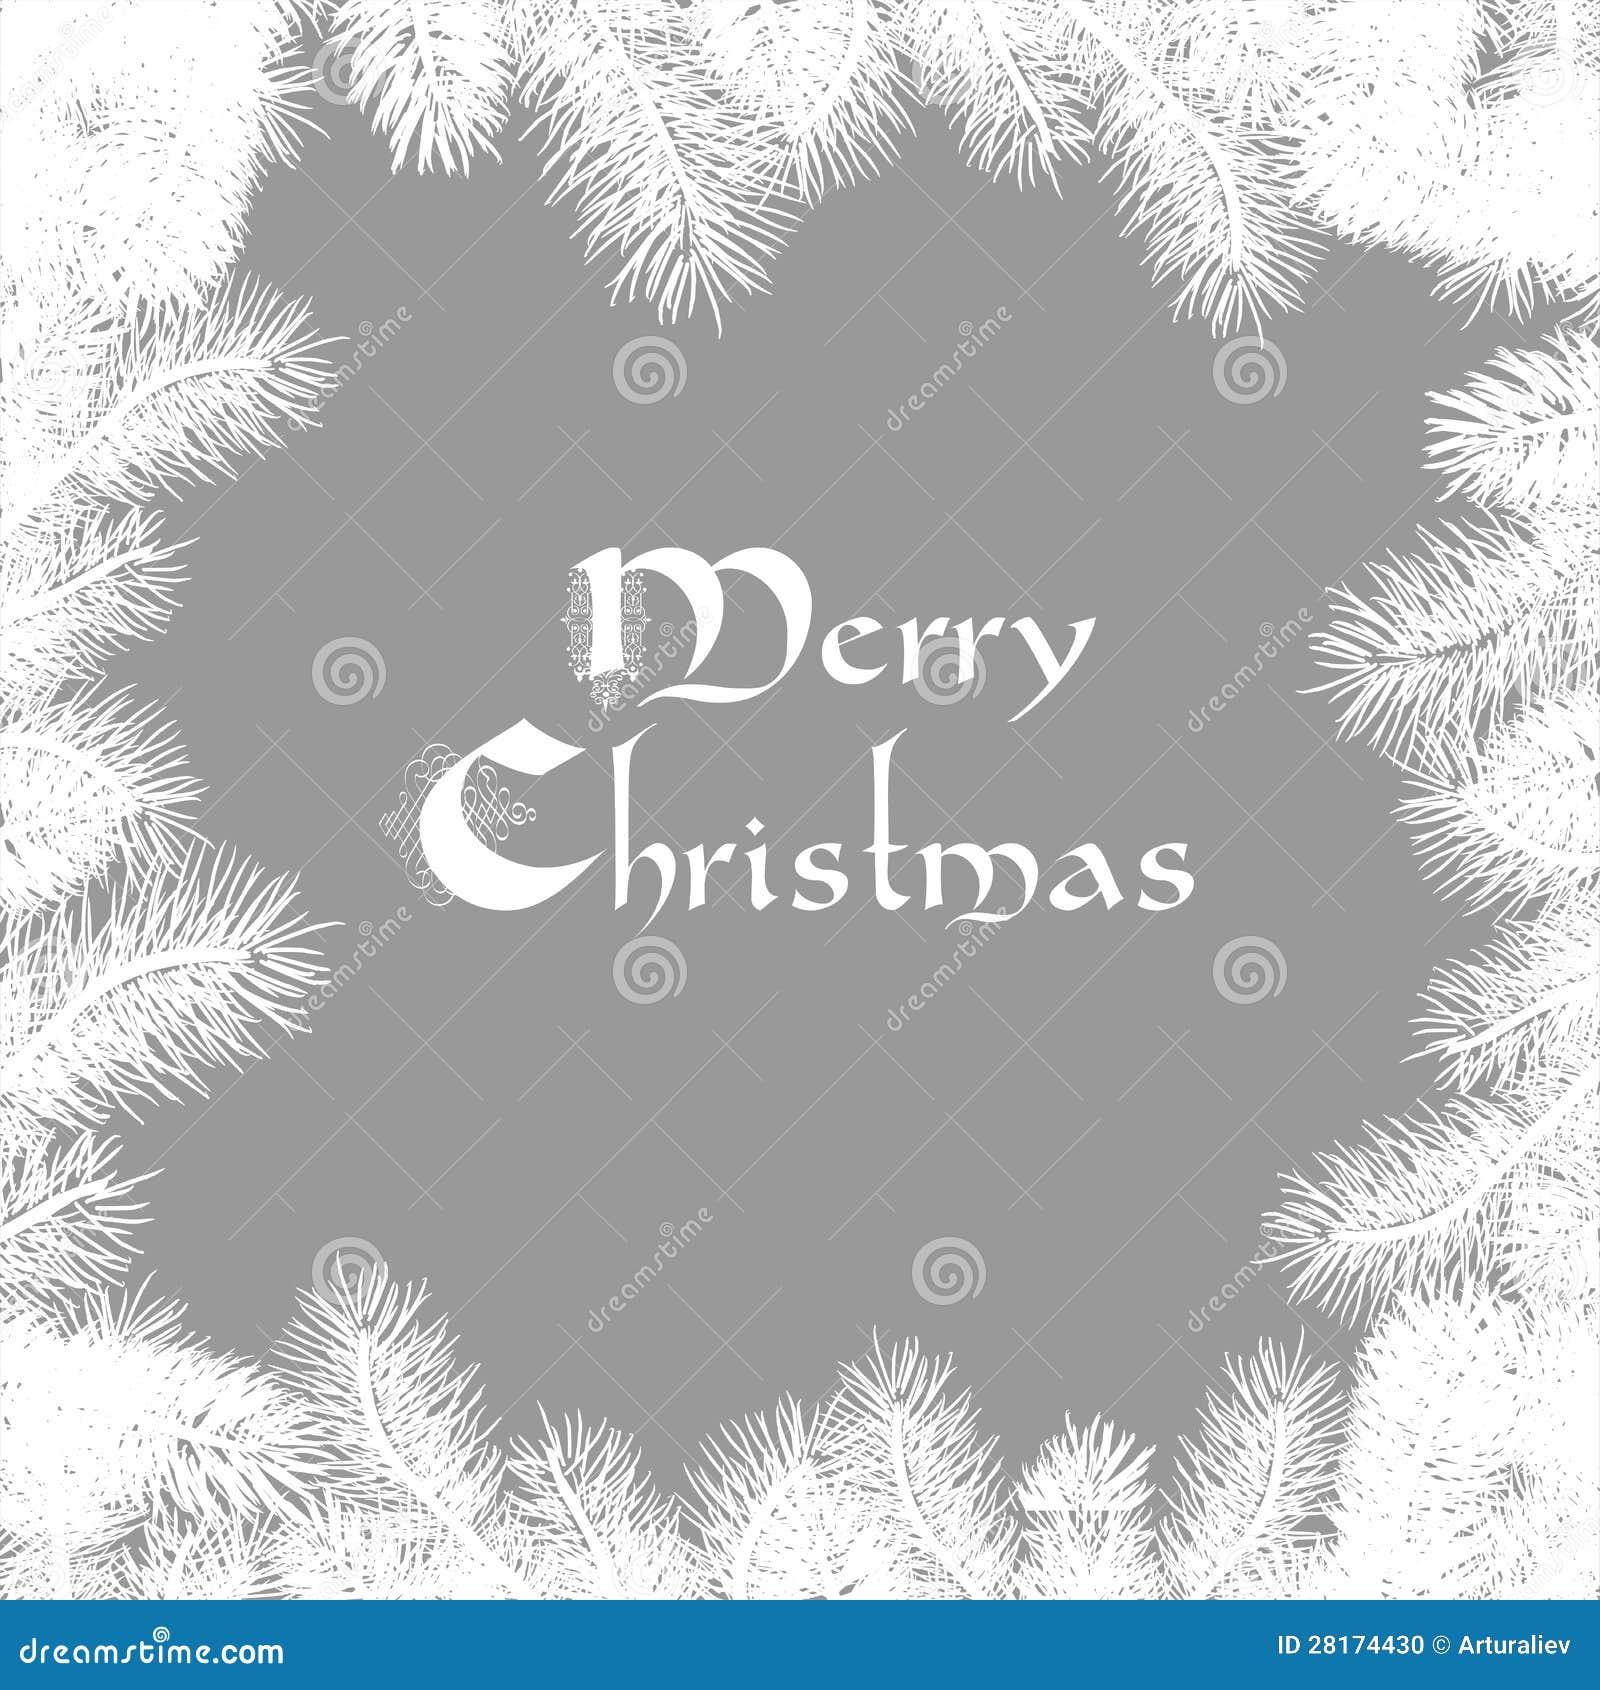 Tarjeta de navidad elegante fotos de stock registrate gratis - Tarjetas de navidad elegantes ...